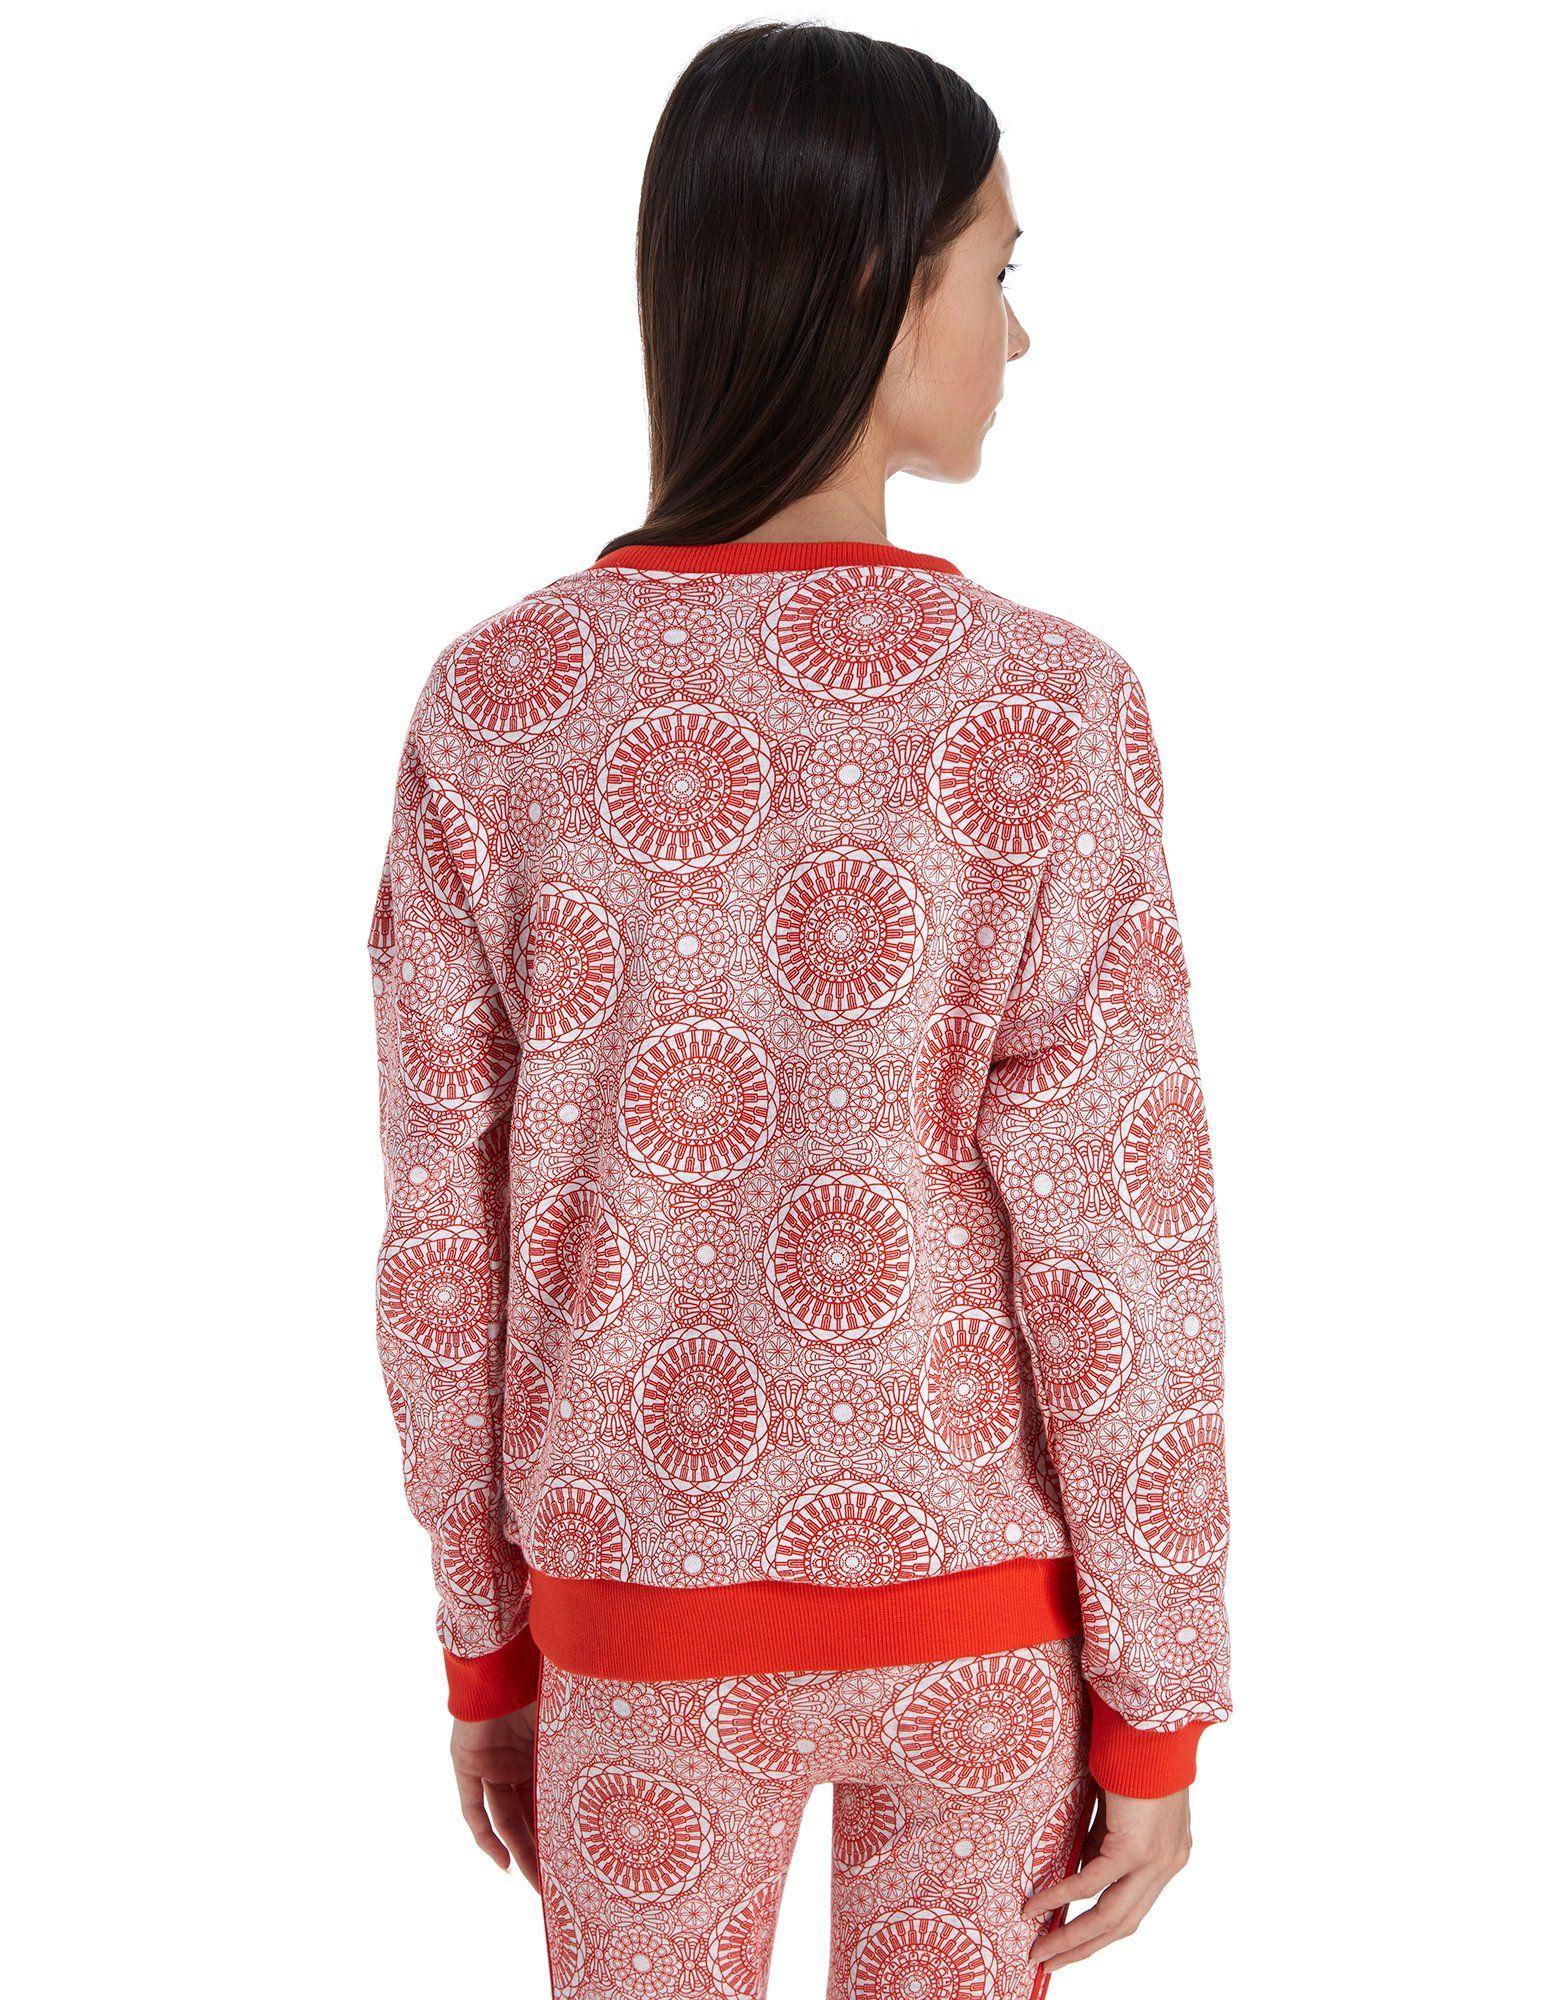 adidas Originals Girls' London Sweatshirt Junior